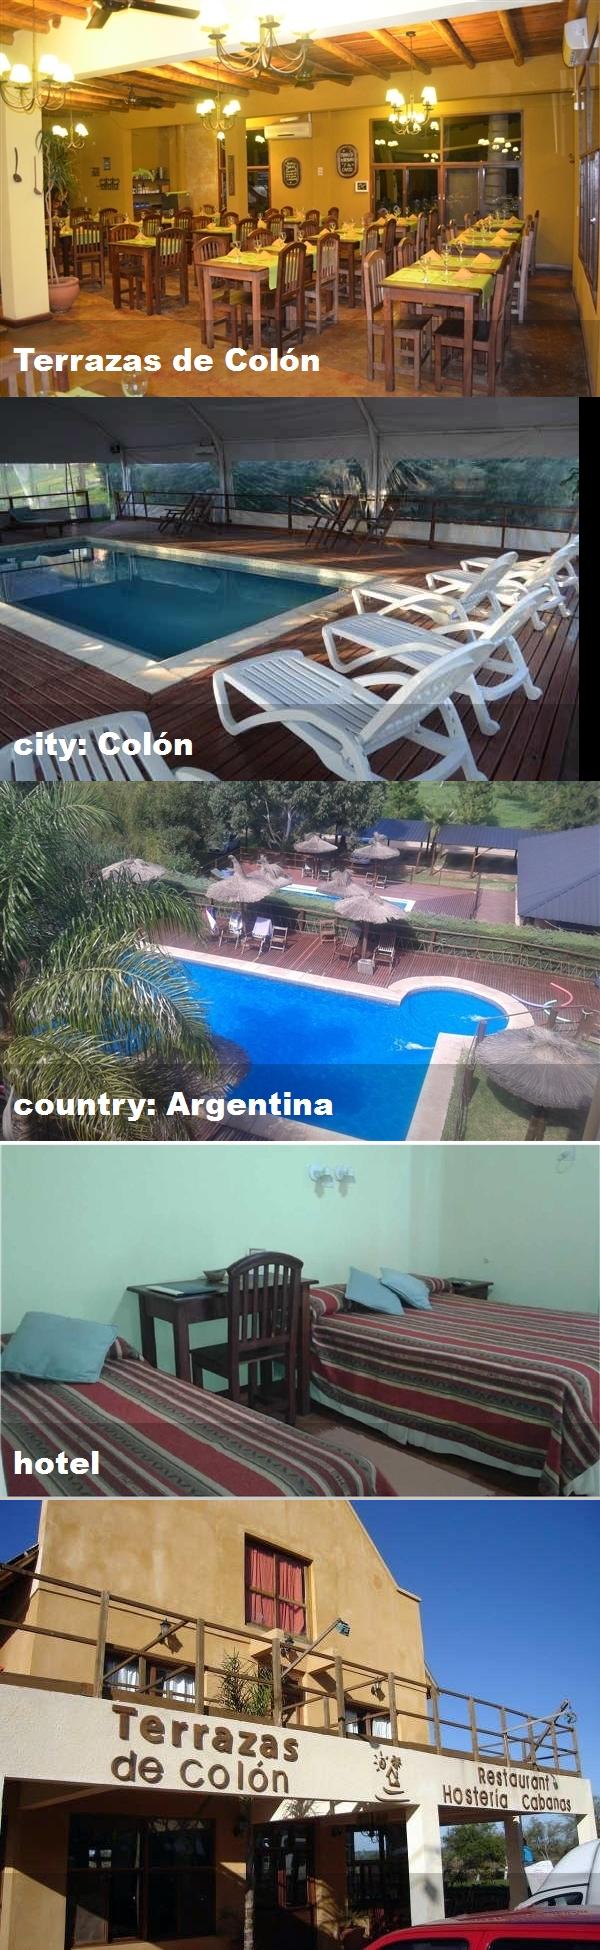 Terrazas De Colon City Colon Country Argentina Hotel Argentina Marina Bay Sands Travel